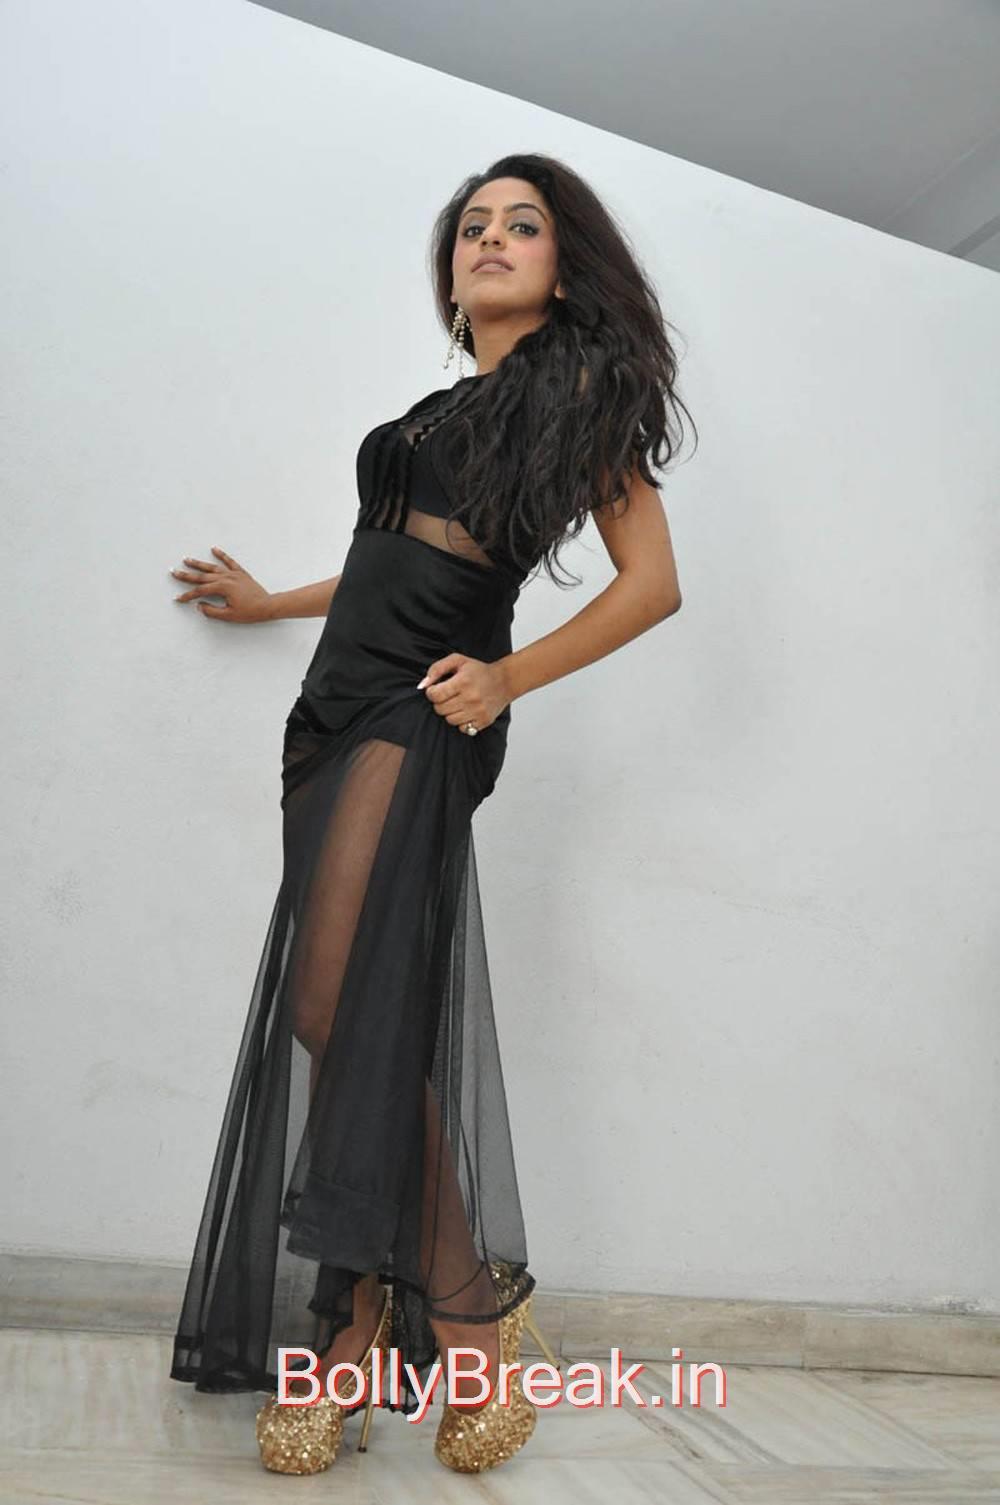 Virti Khanna Pics At Calling Bell Movie Audio Release, Virti Khanna Hot Pics from Calling Bell Movie Audio Launch